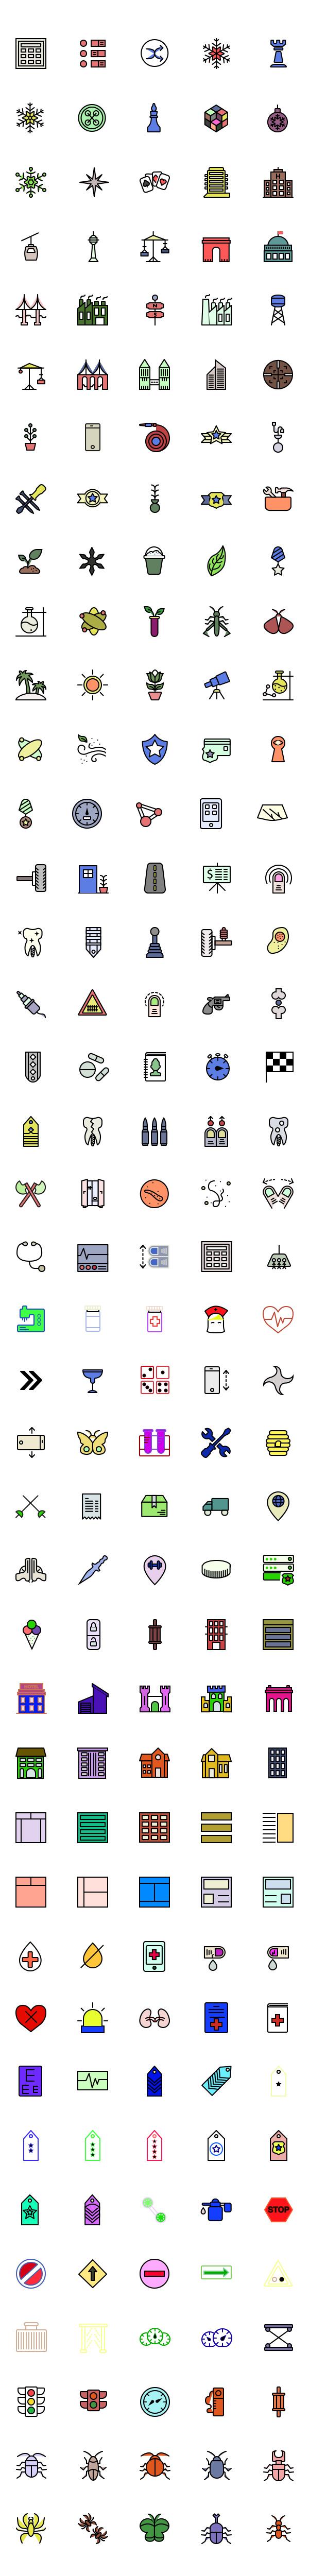 RetinaIcon: 200 Free Icons